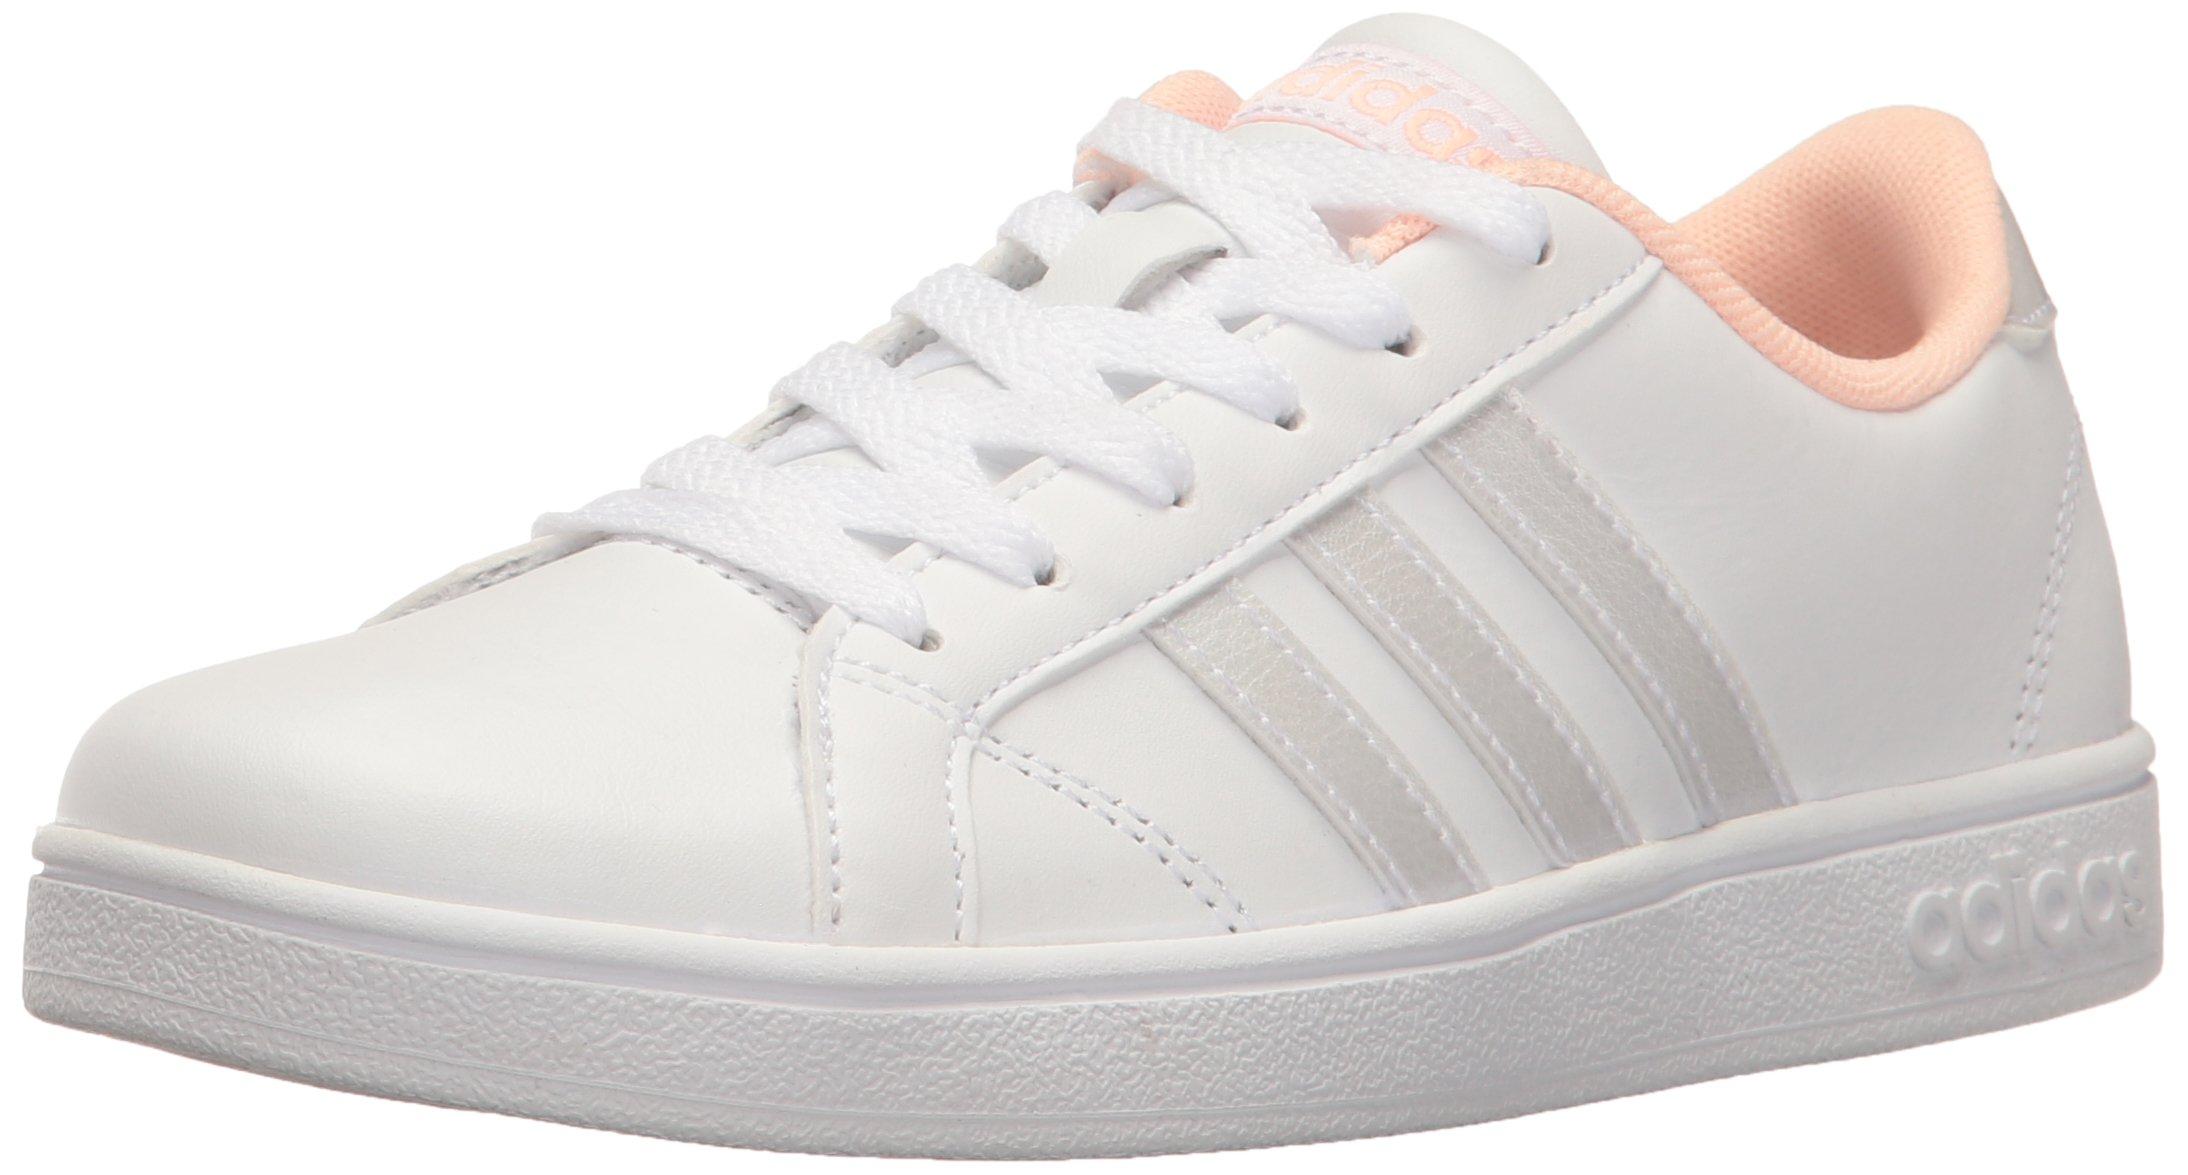 adidas Unisex-Kid's Baseline K Sneaker White/Coral, 7